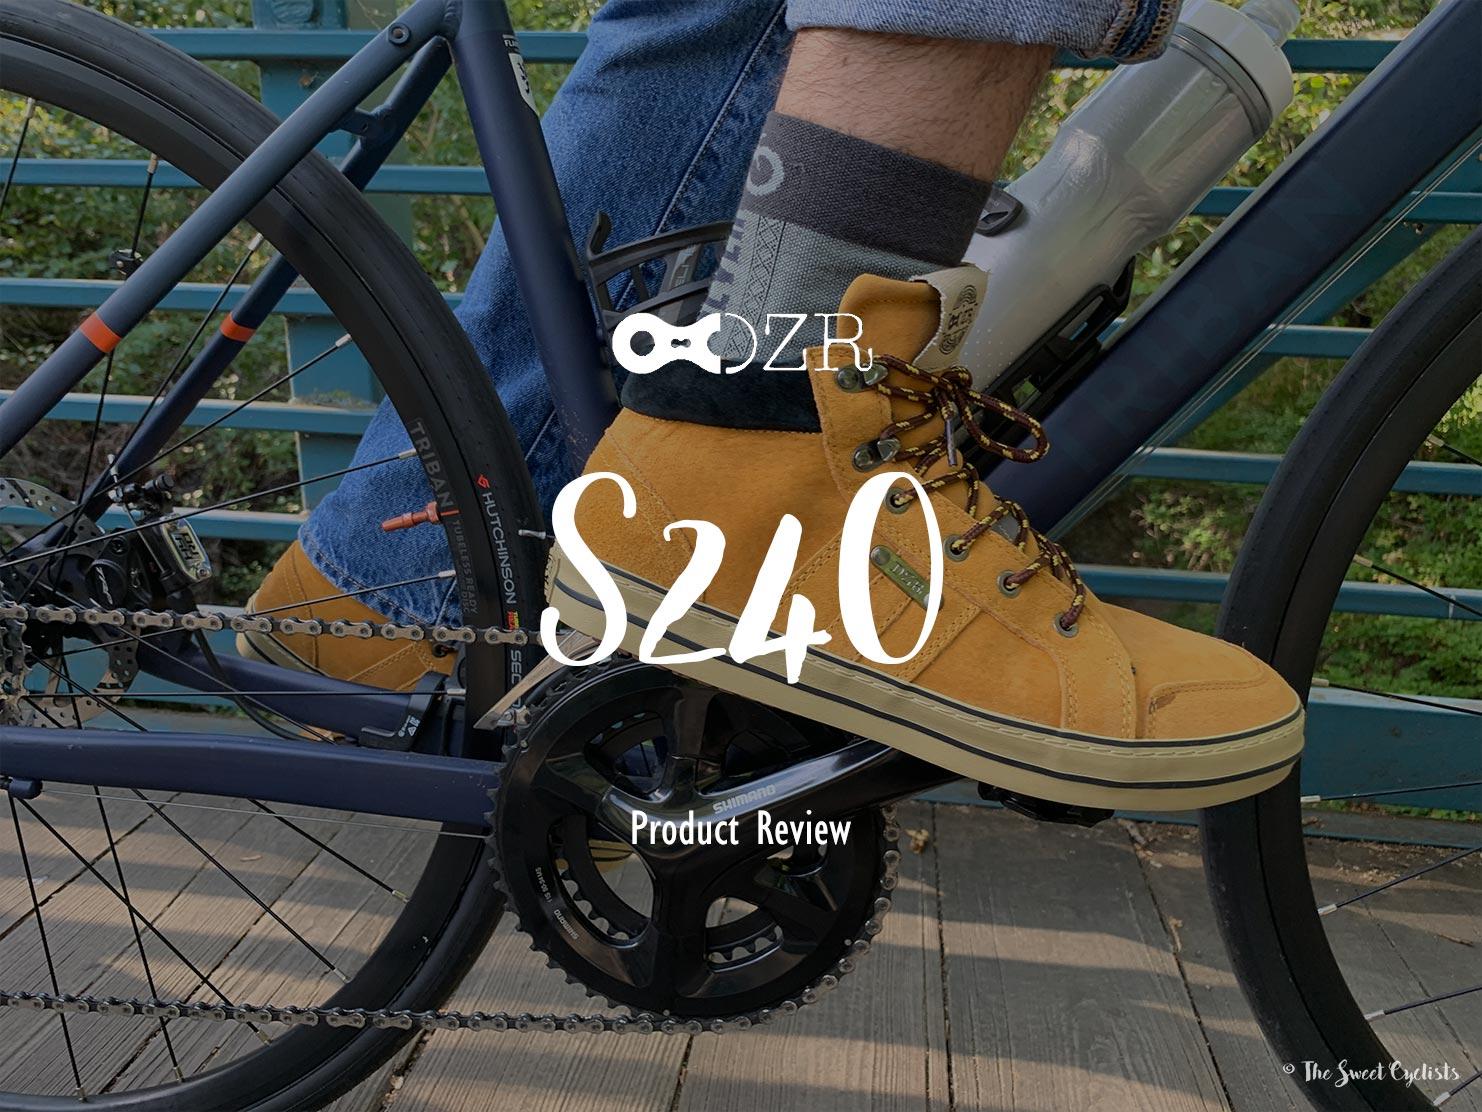 DZR S24O – Urban Chic shoes designed for riding